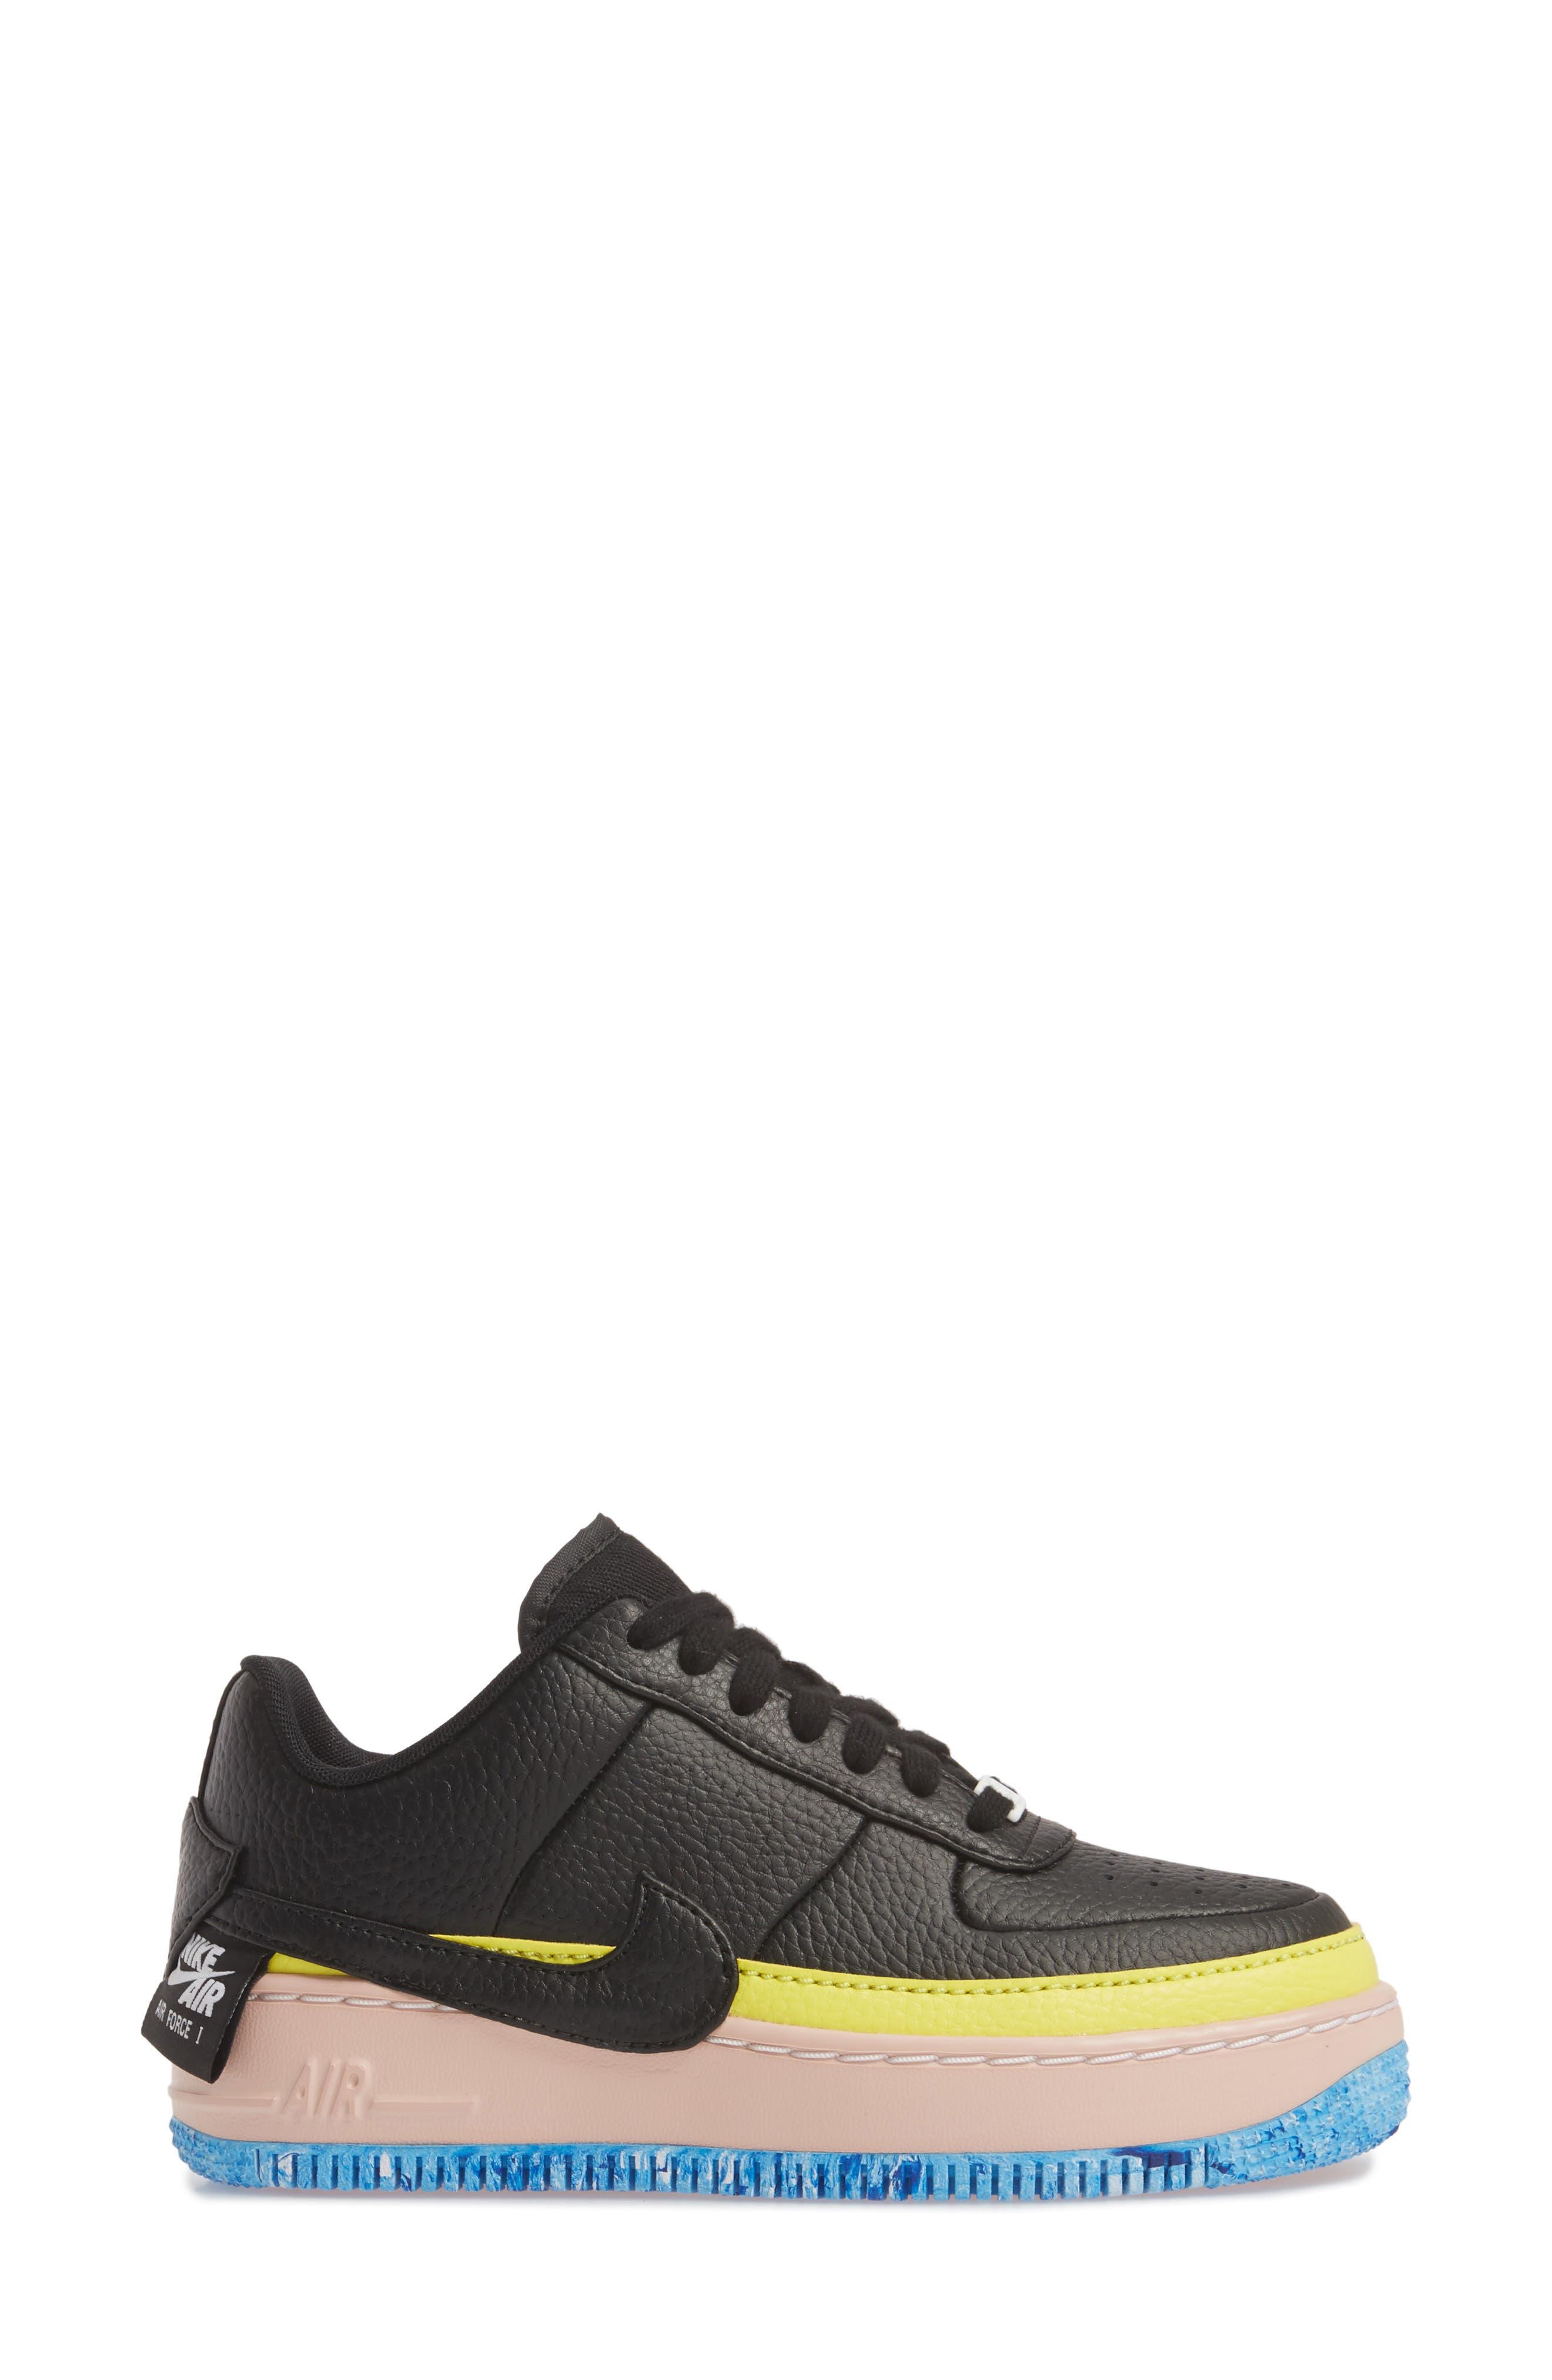 Air Force 1 Jester XX Sneaker,                             Alternate thumbnail 3, color,                             BLACK/ SONIC YELLOW/ ORANGE